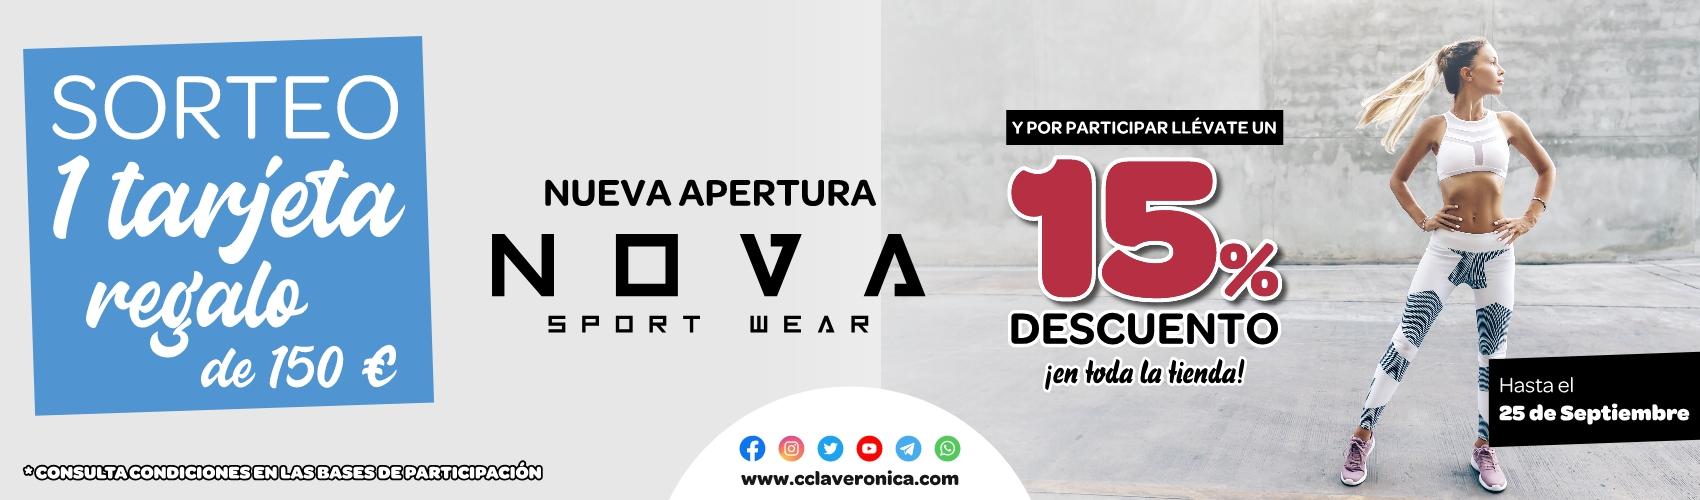 Sorteo tarjeta regalo Nova Sport wear